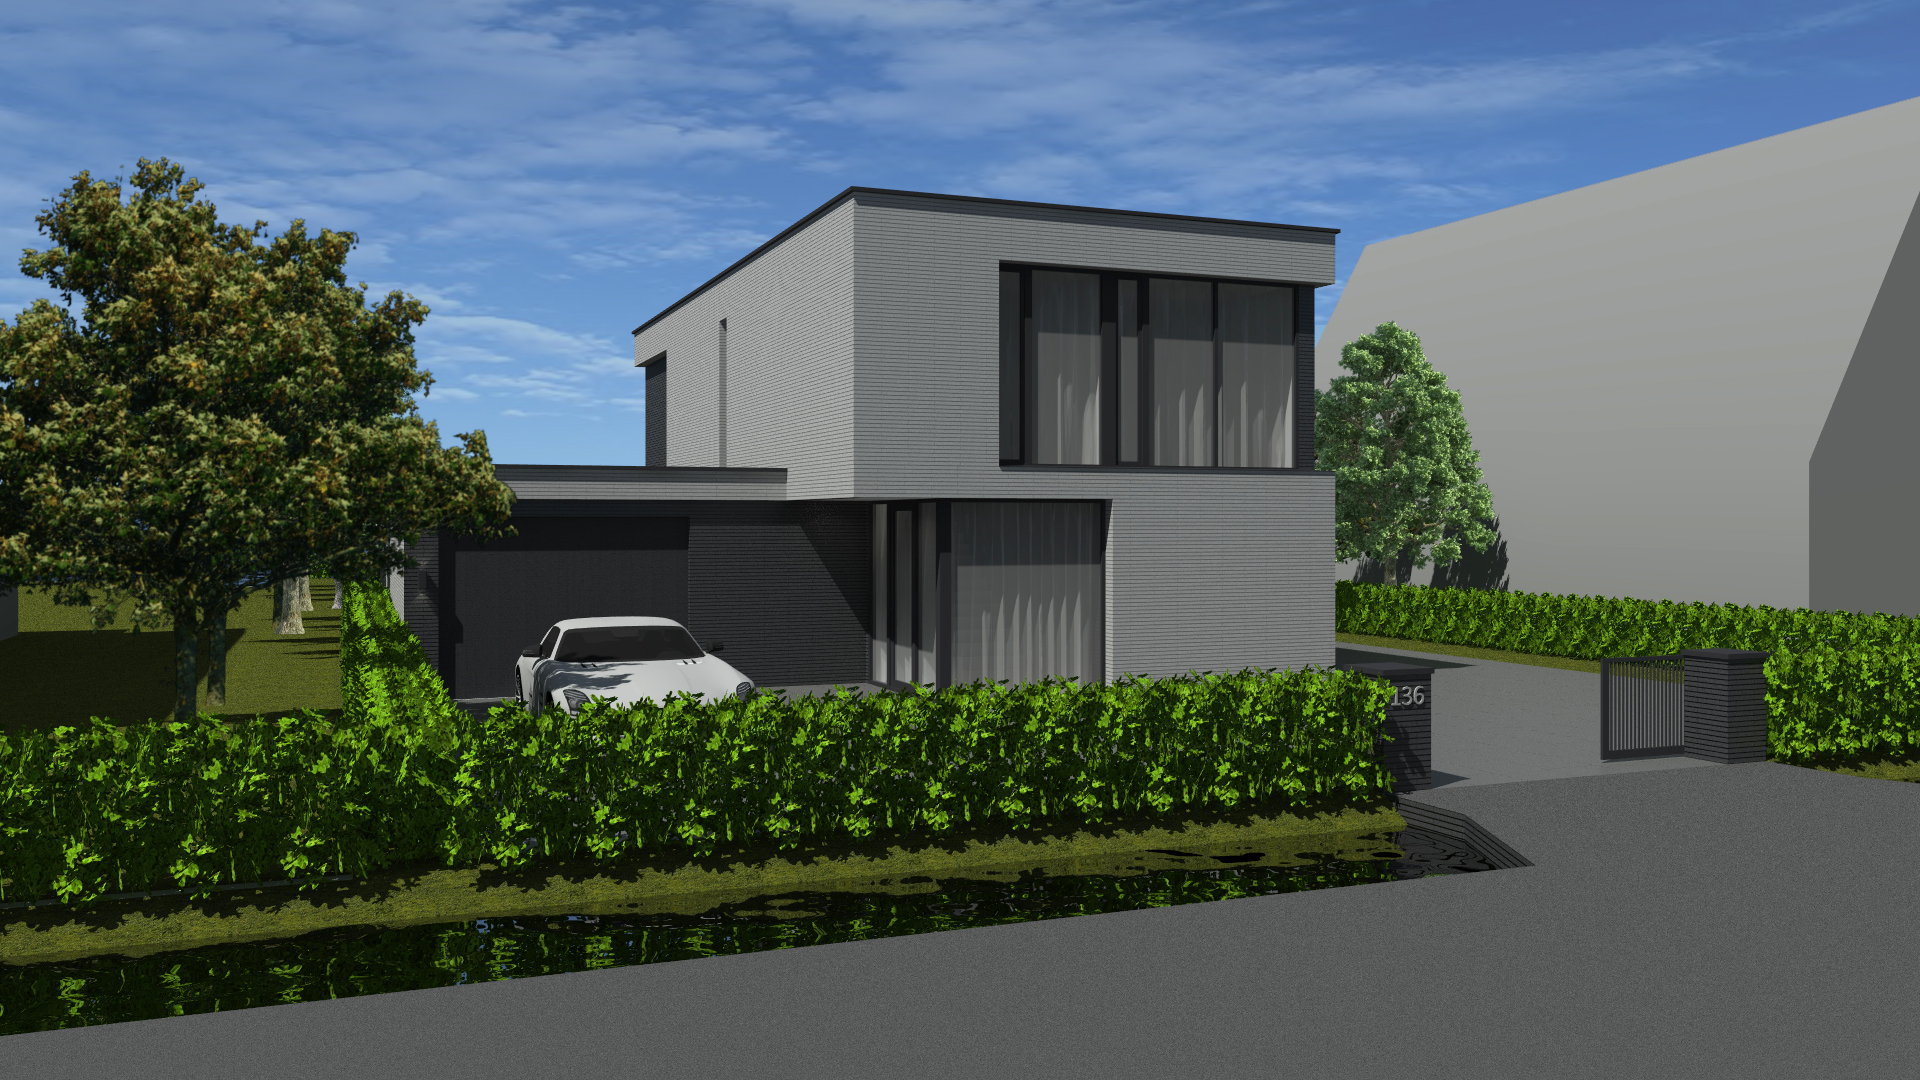 Nieuwbouwwoning Vinkeveense plassen met moderne vormen in metselwerk.